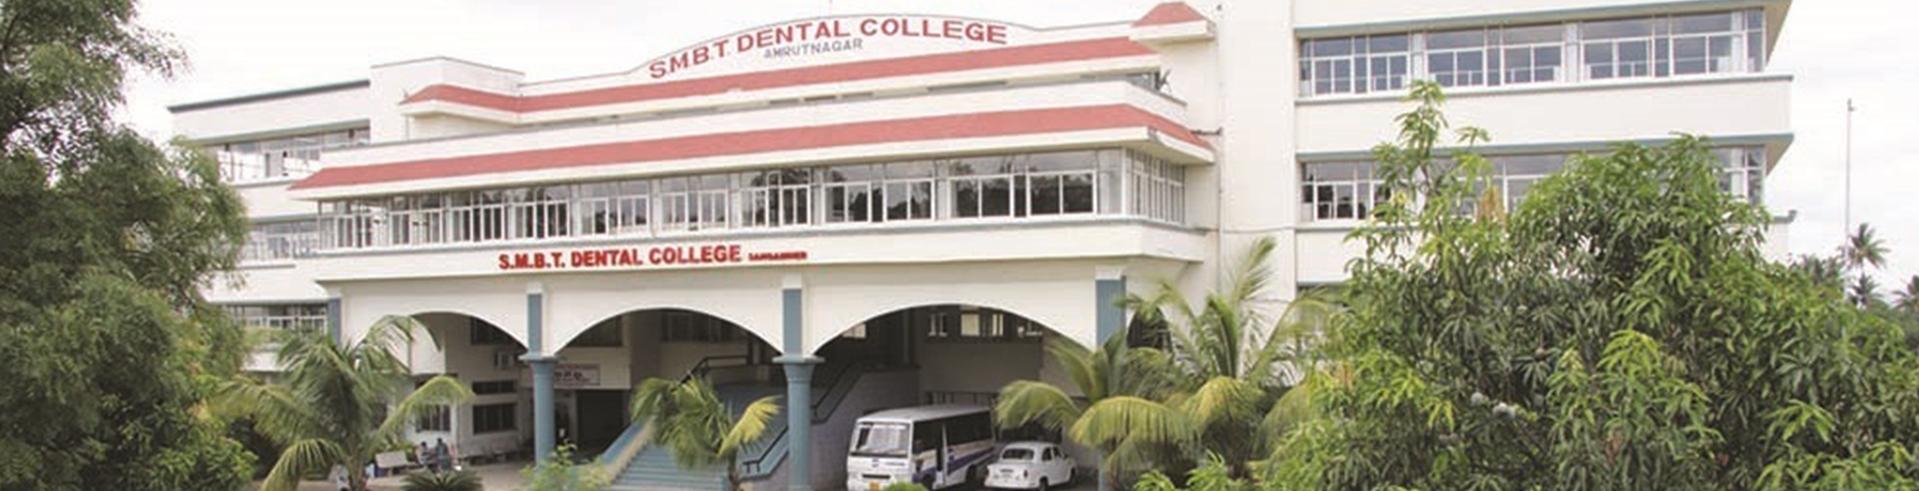 S.M.B.T. Dental College and Hospital, Amrutnagar Image